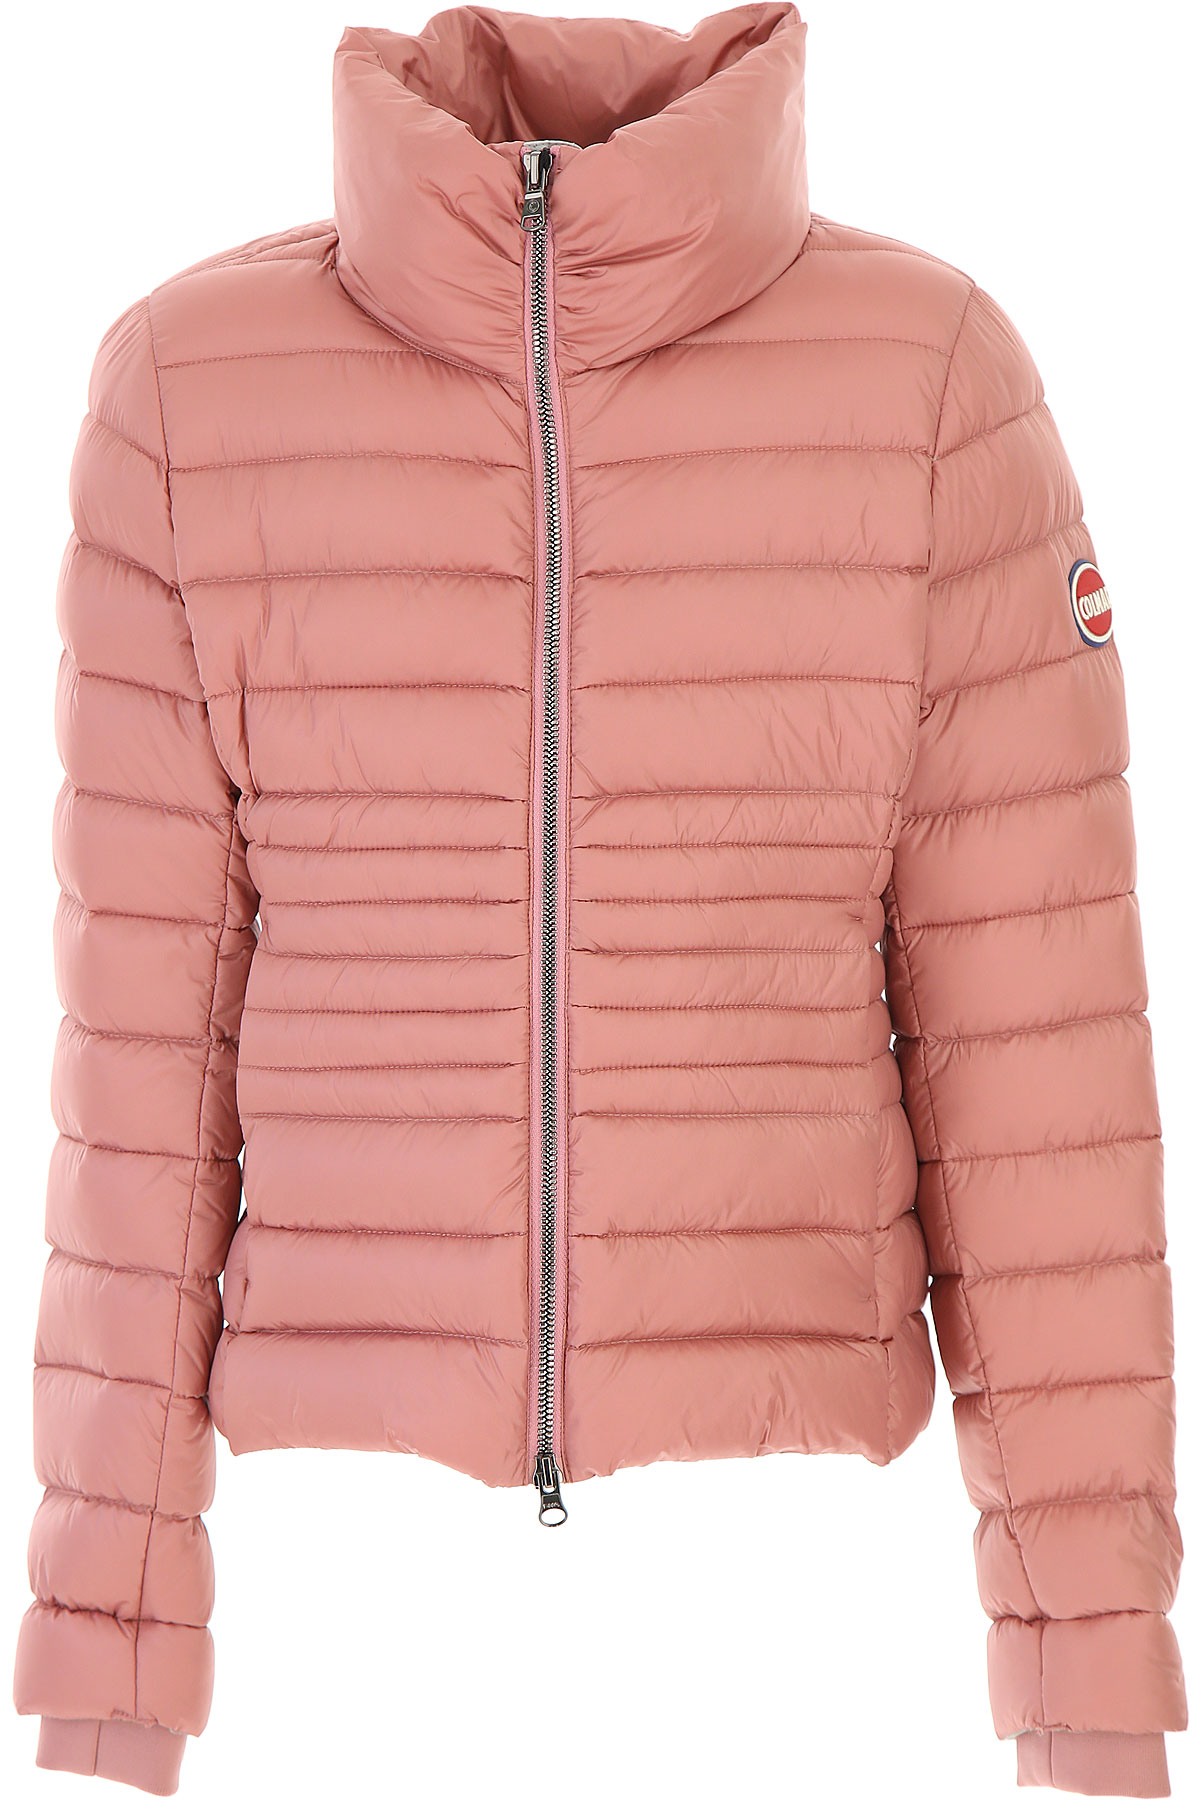 Colmar Girls Down Jacket for Kids, Puffer Ski Jacket On Sale, Baroque Pink, polyamide, 2019, 6Y 8Y